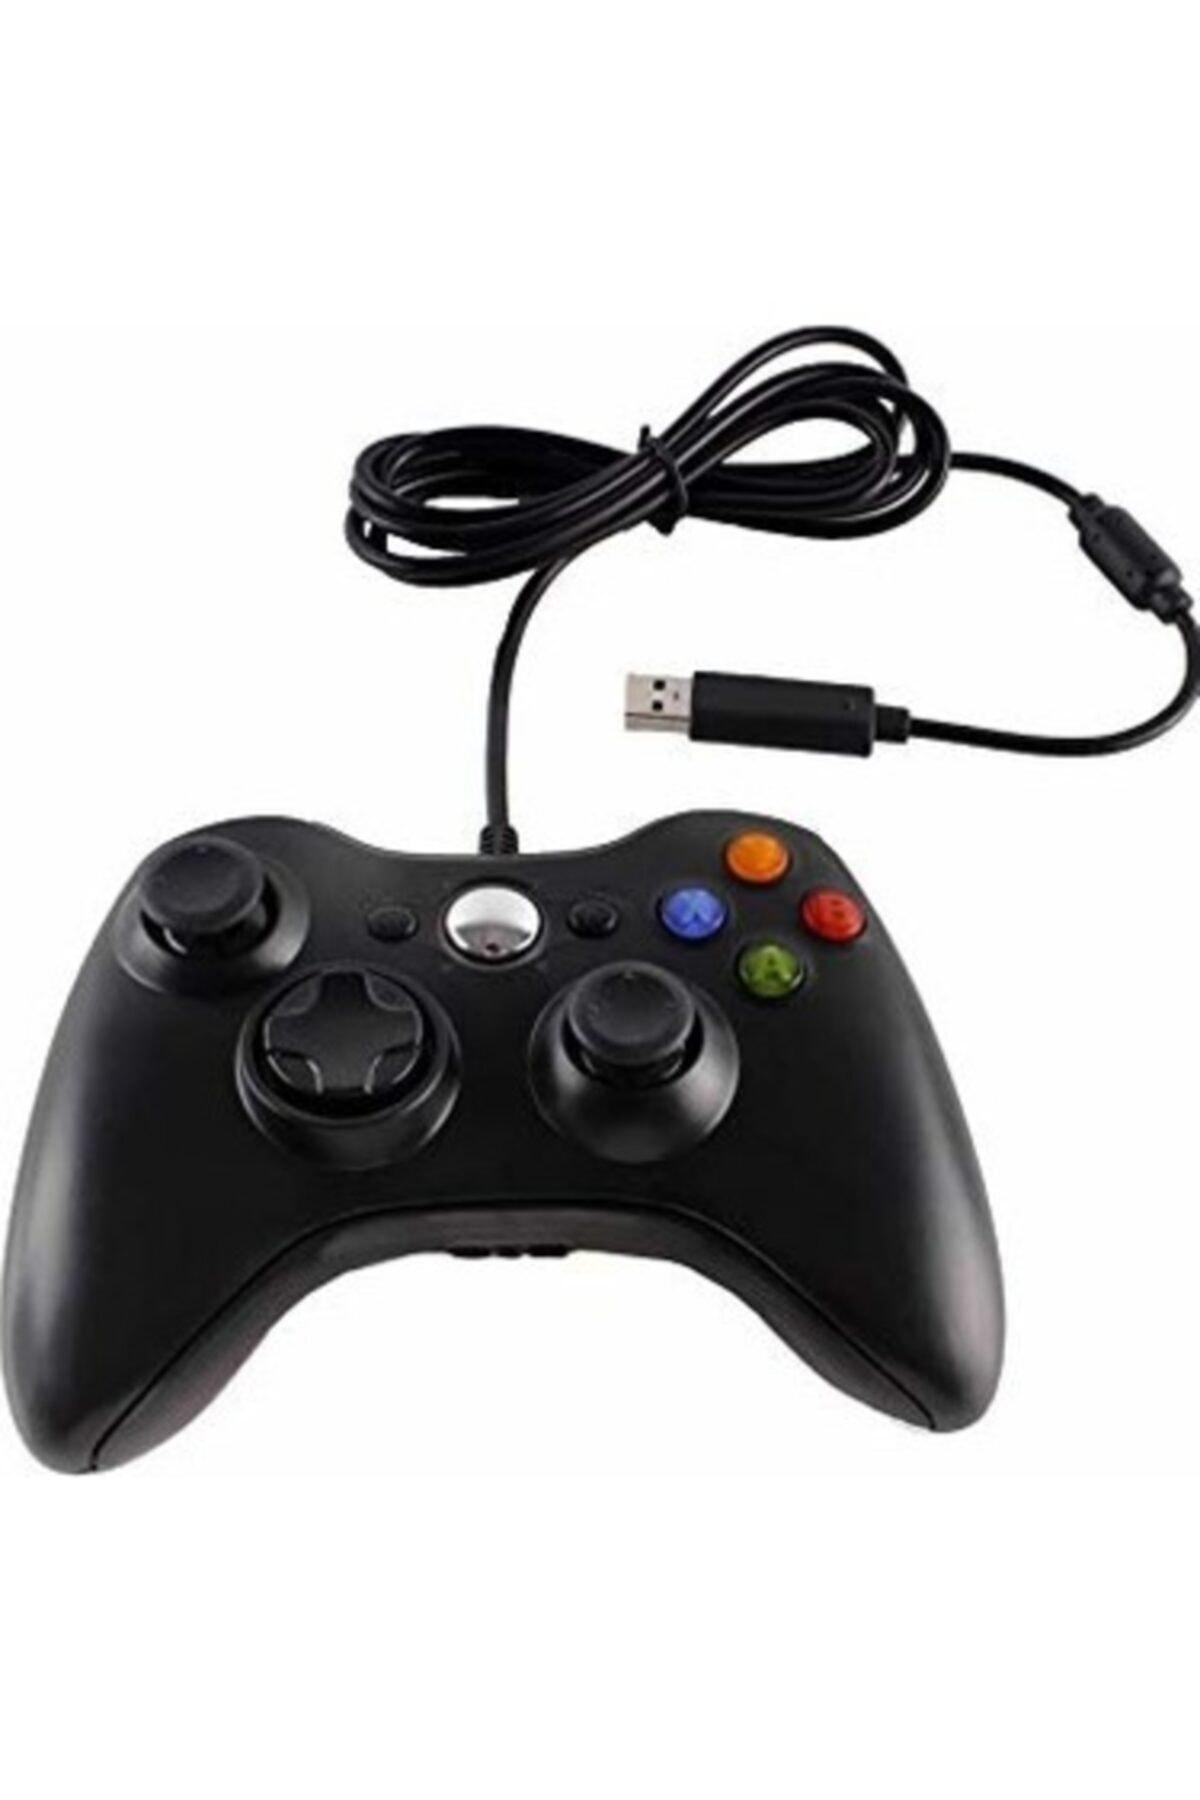 CAN Xbox 360 Pc Uyumlu Wired Kablolu Kol Gamepad Joystick Controller 1